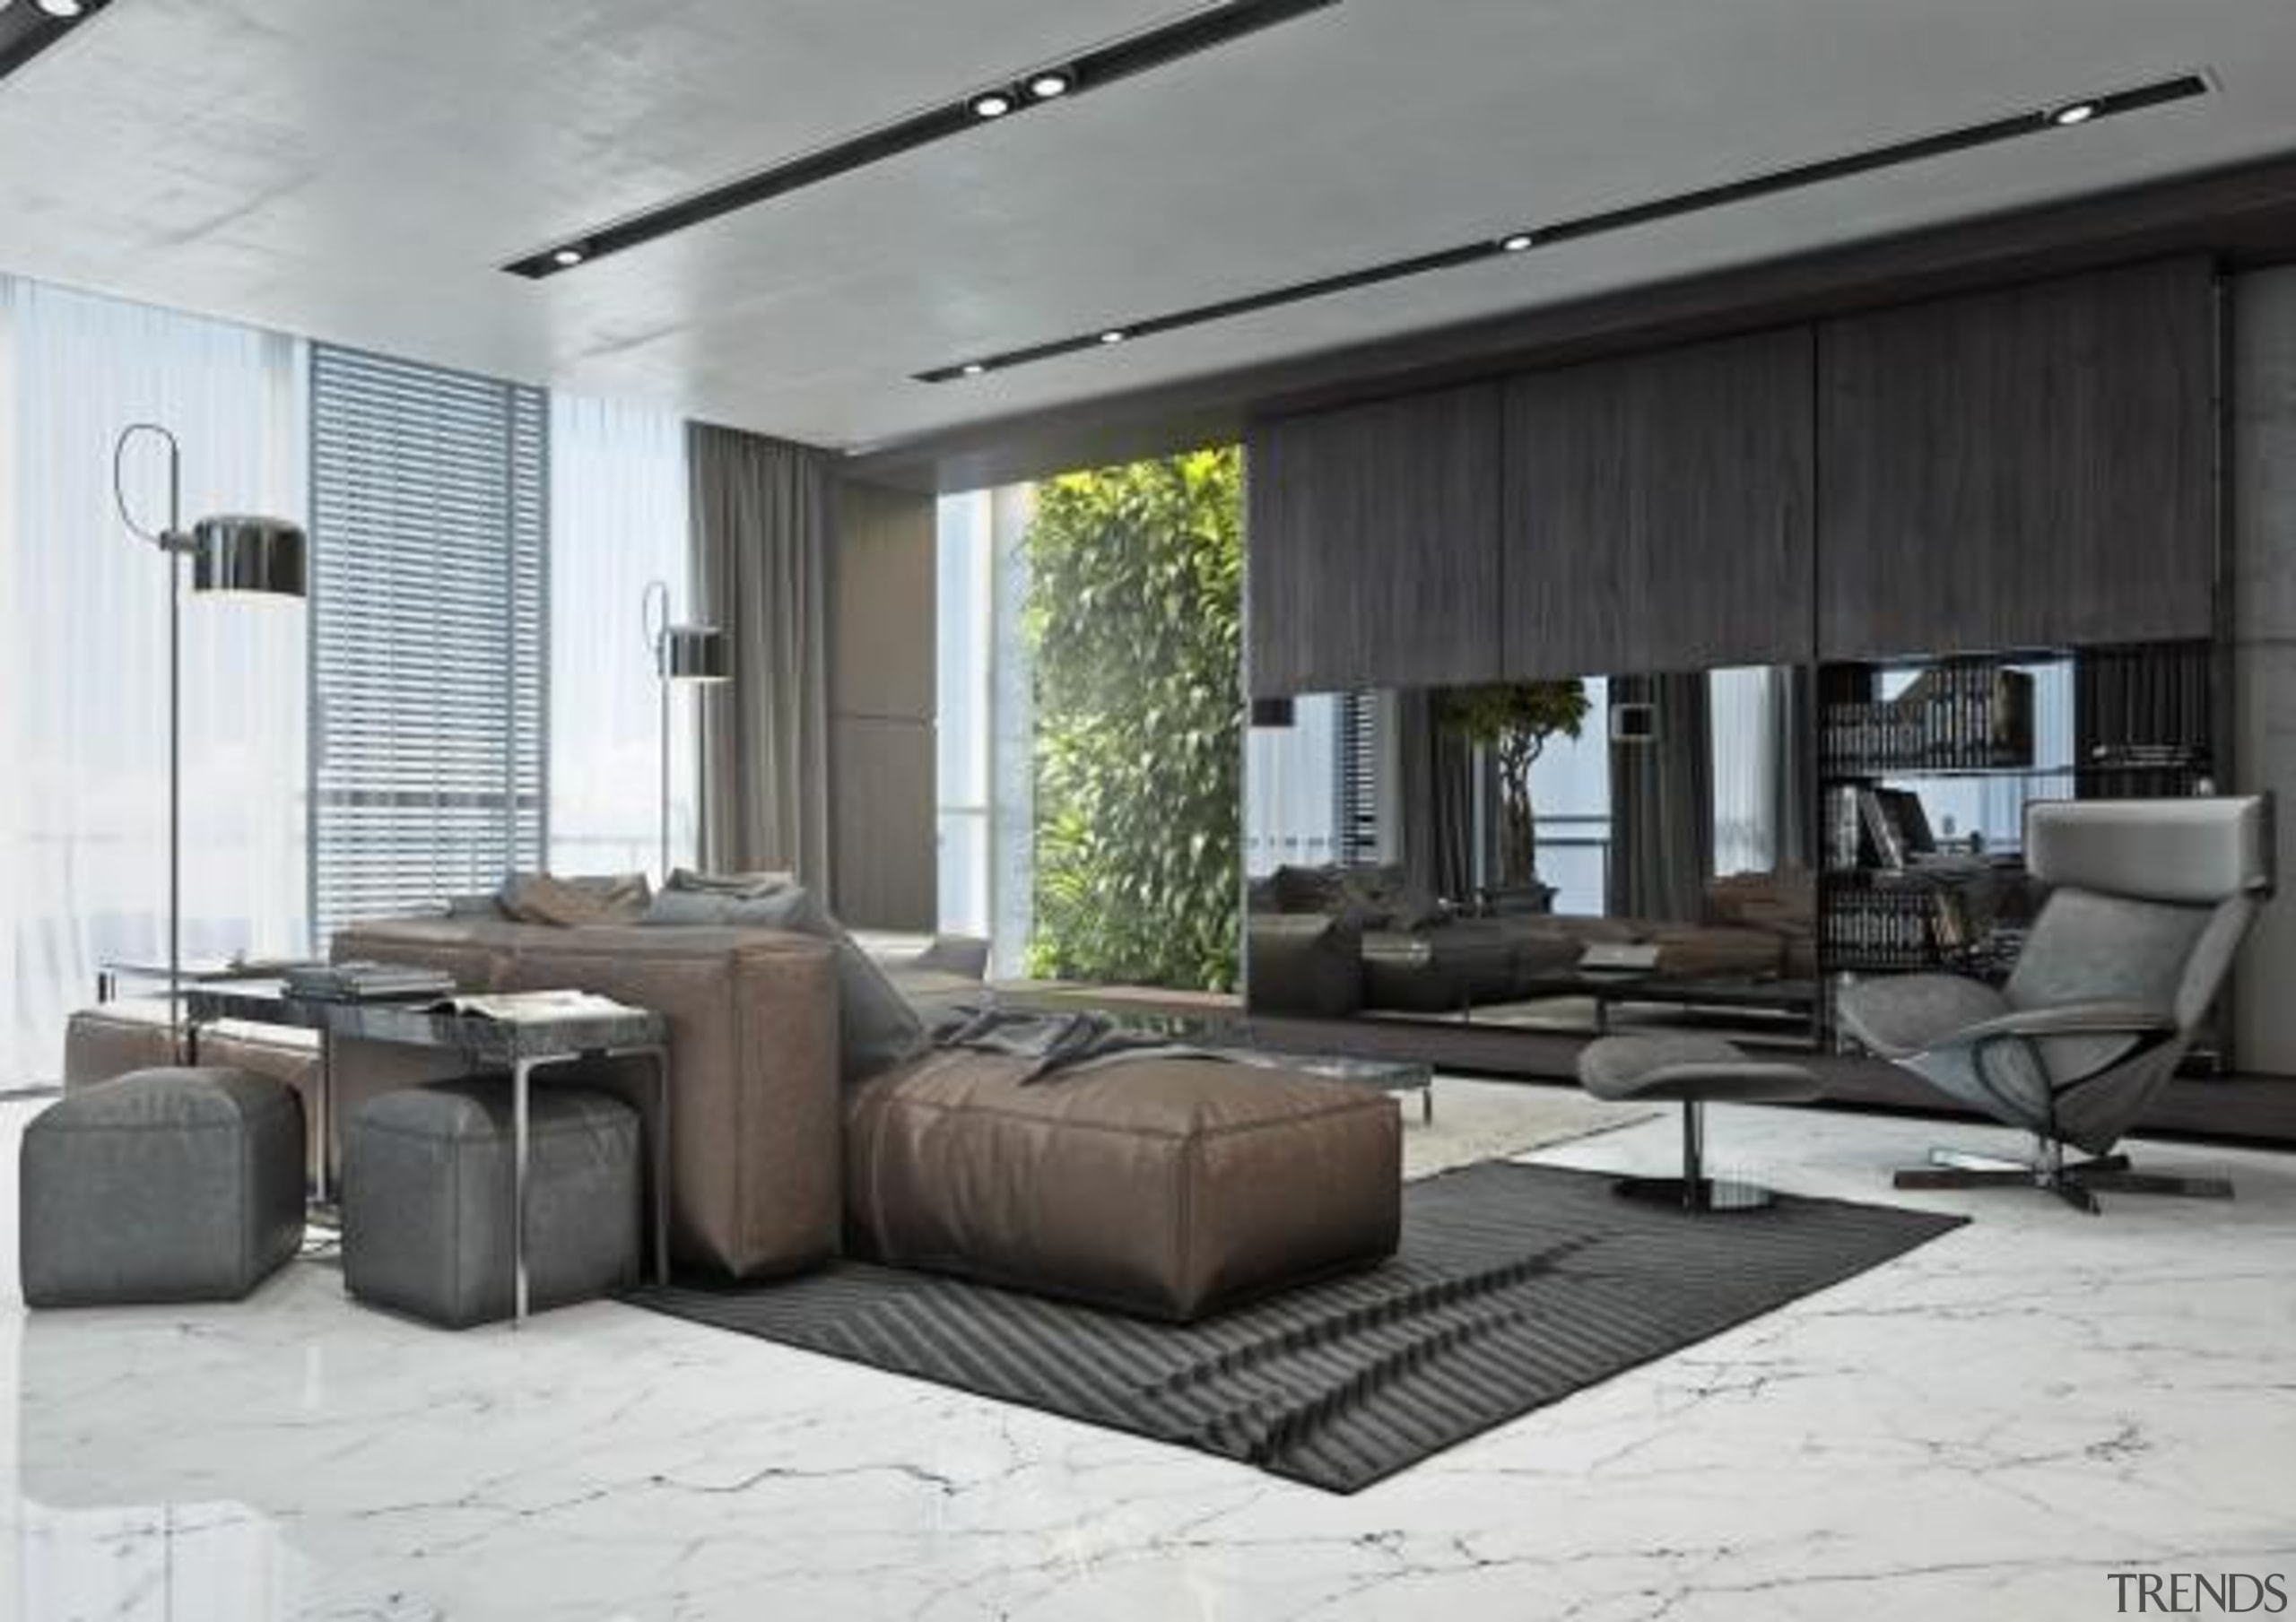 slick livingroom - Masculine Apartments - ceiling   ceiling, floor, furniture, house, interior design, living room, property, white, gray, black